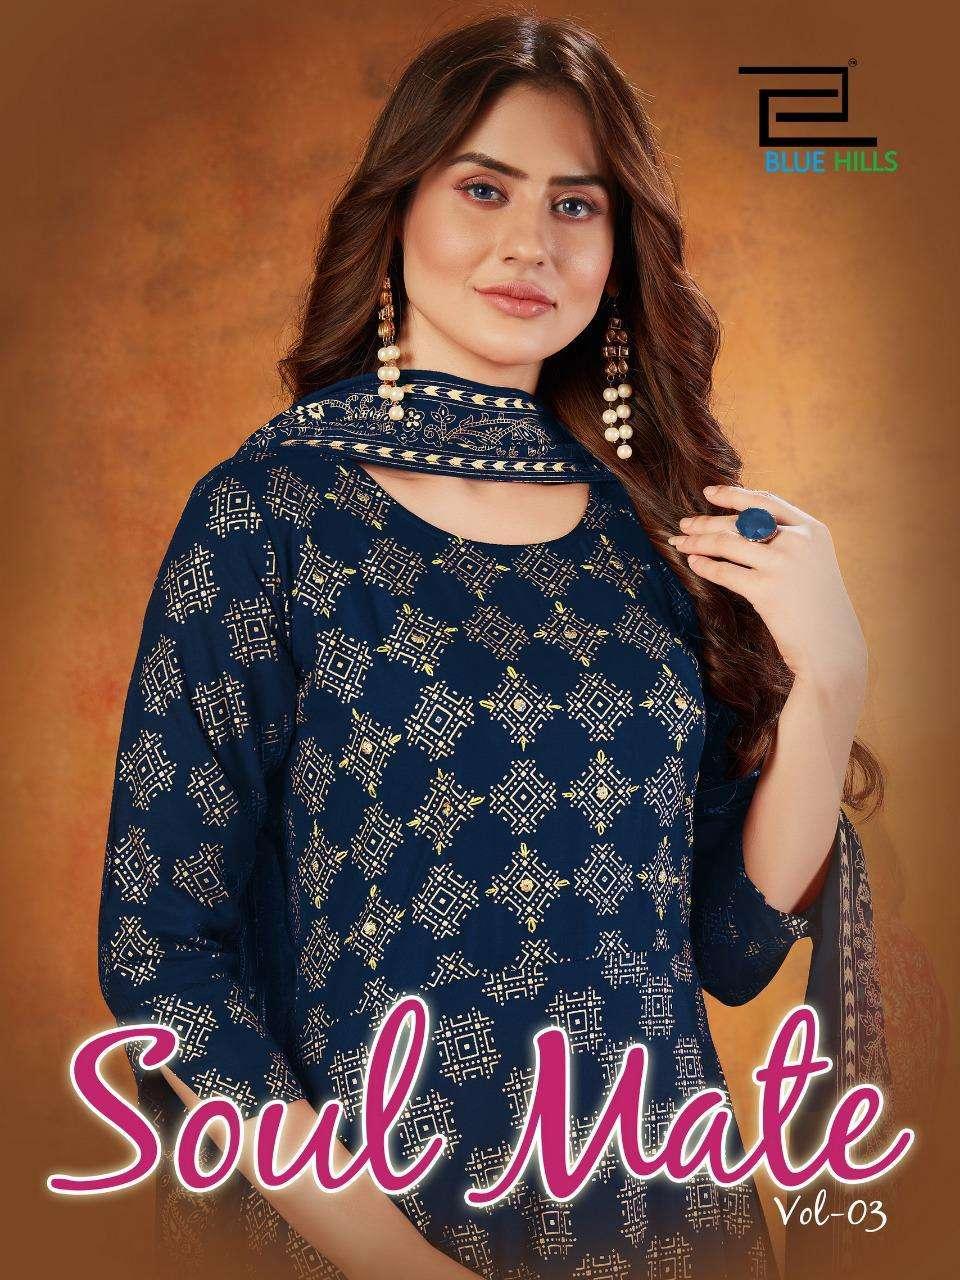 Blue Hills Soul Mate Vol 3 By Vf India Kurti Gown Dupatta Set Catalog Supplier